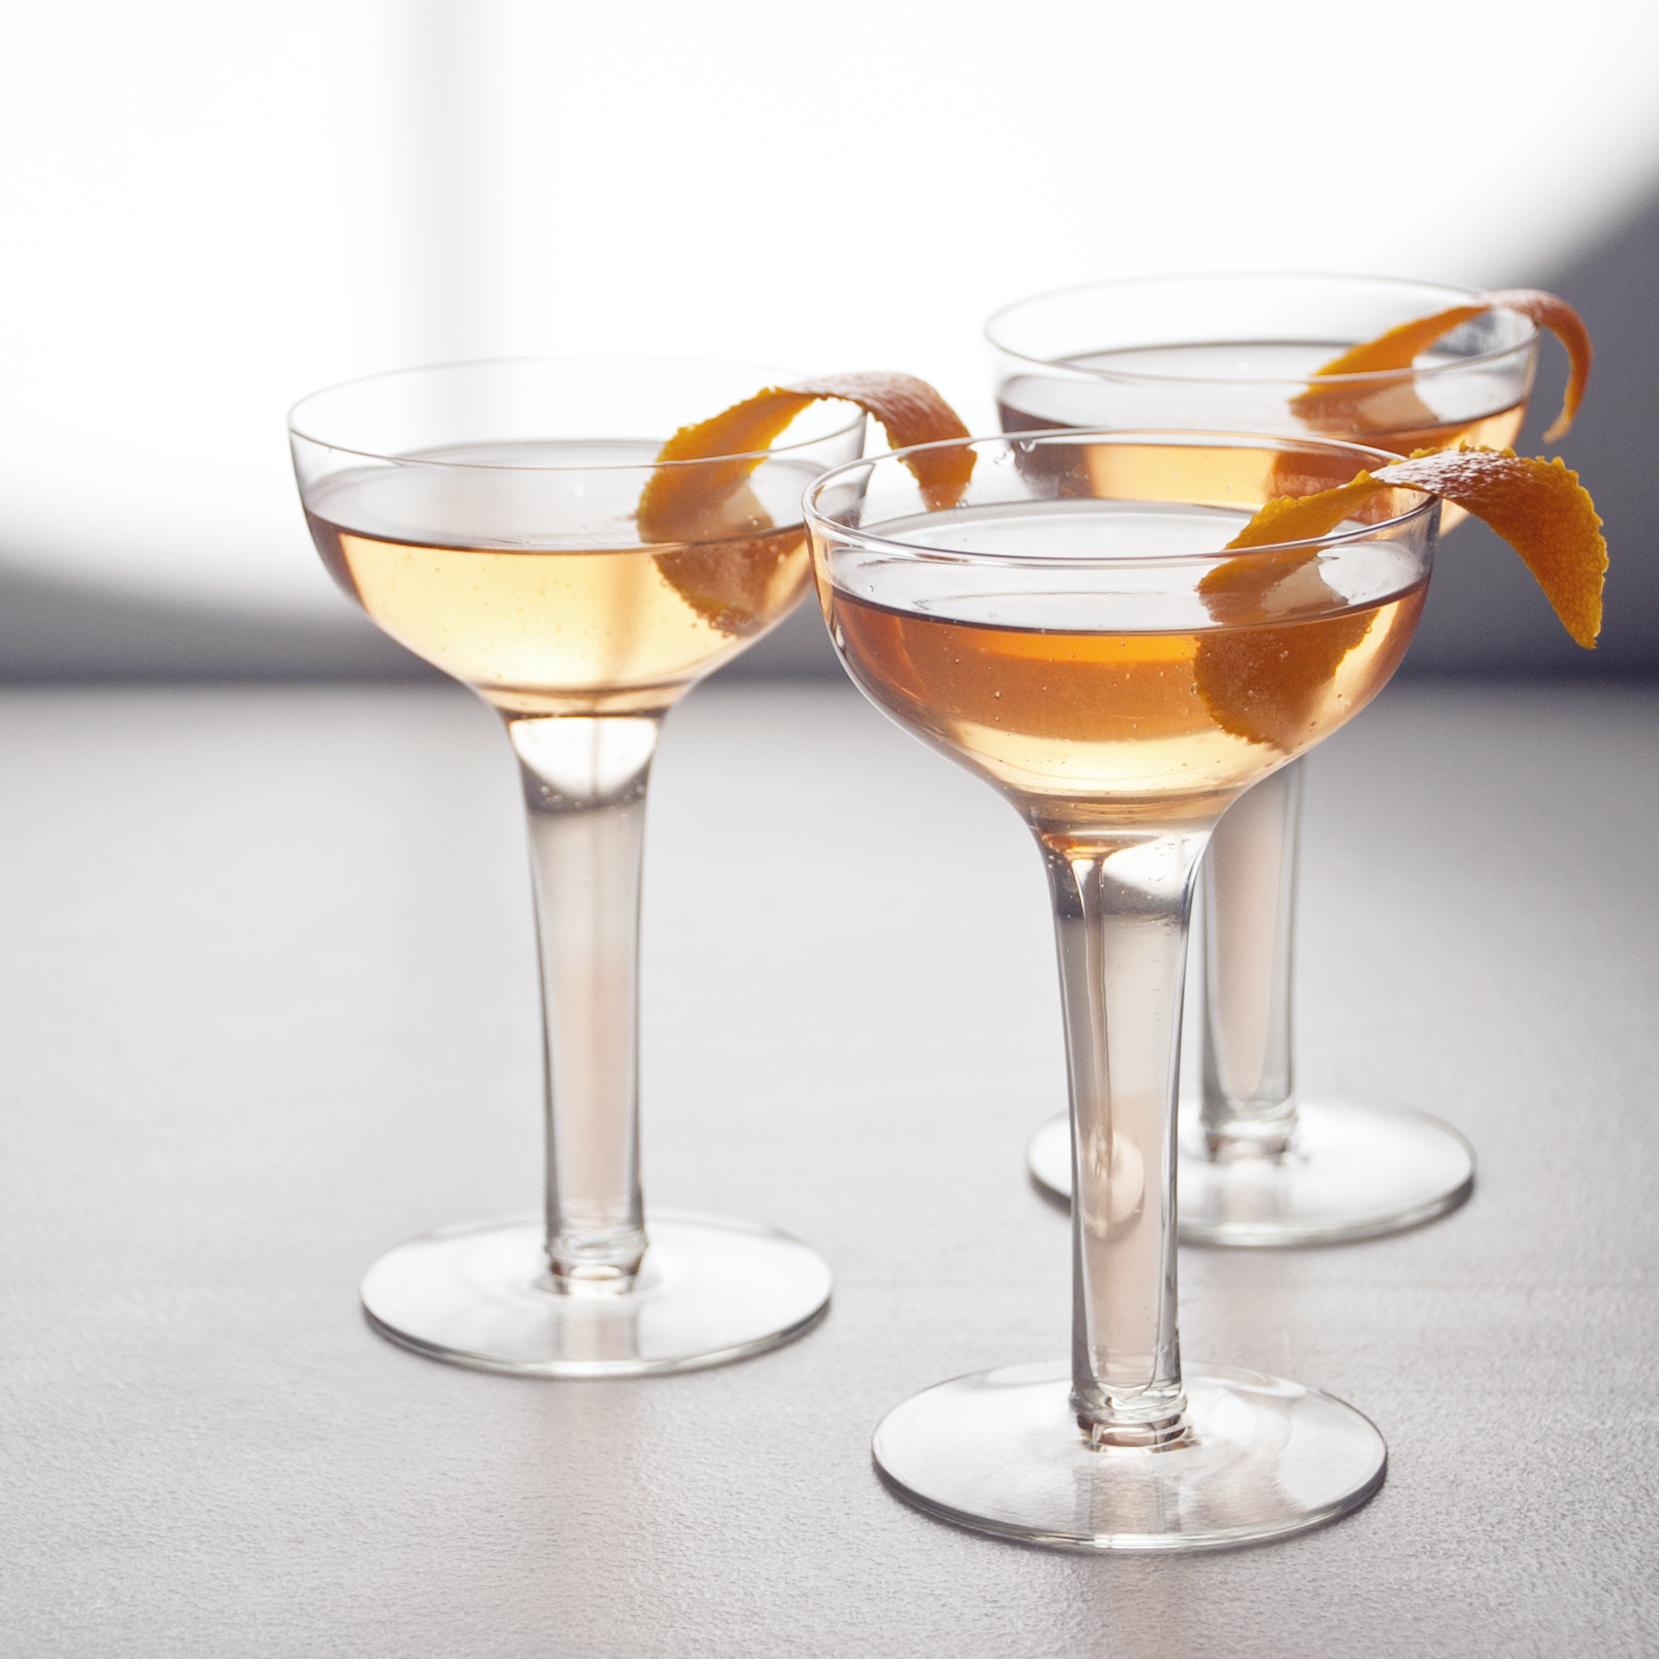 Sparkling Lillet and Grapefruit Cocktail